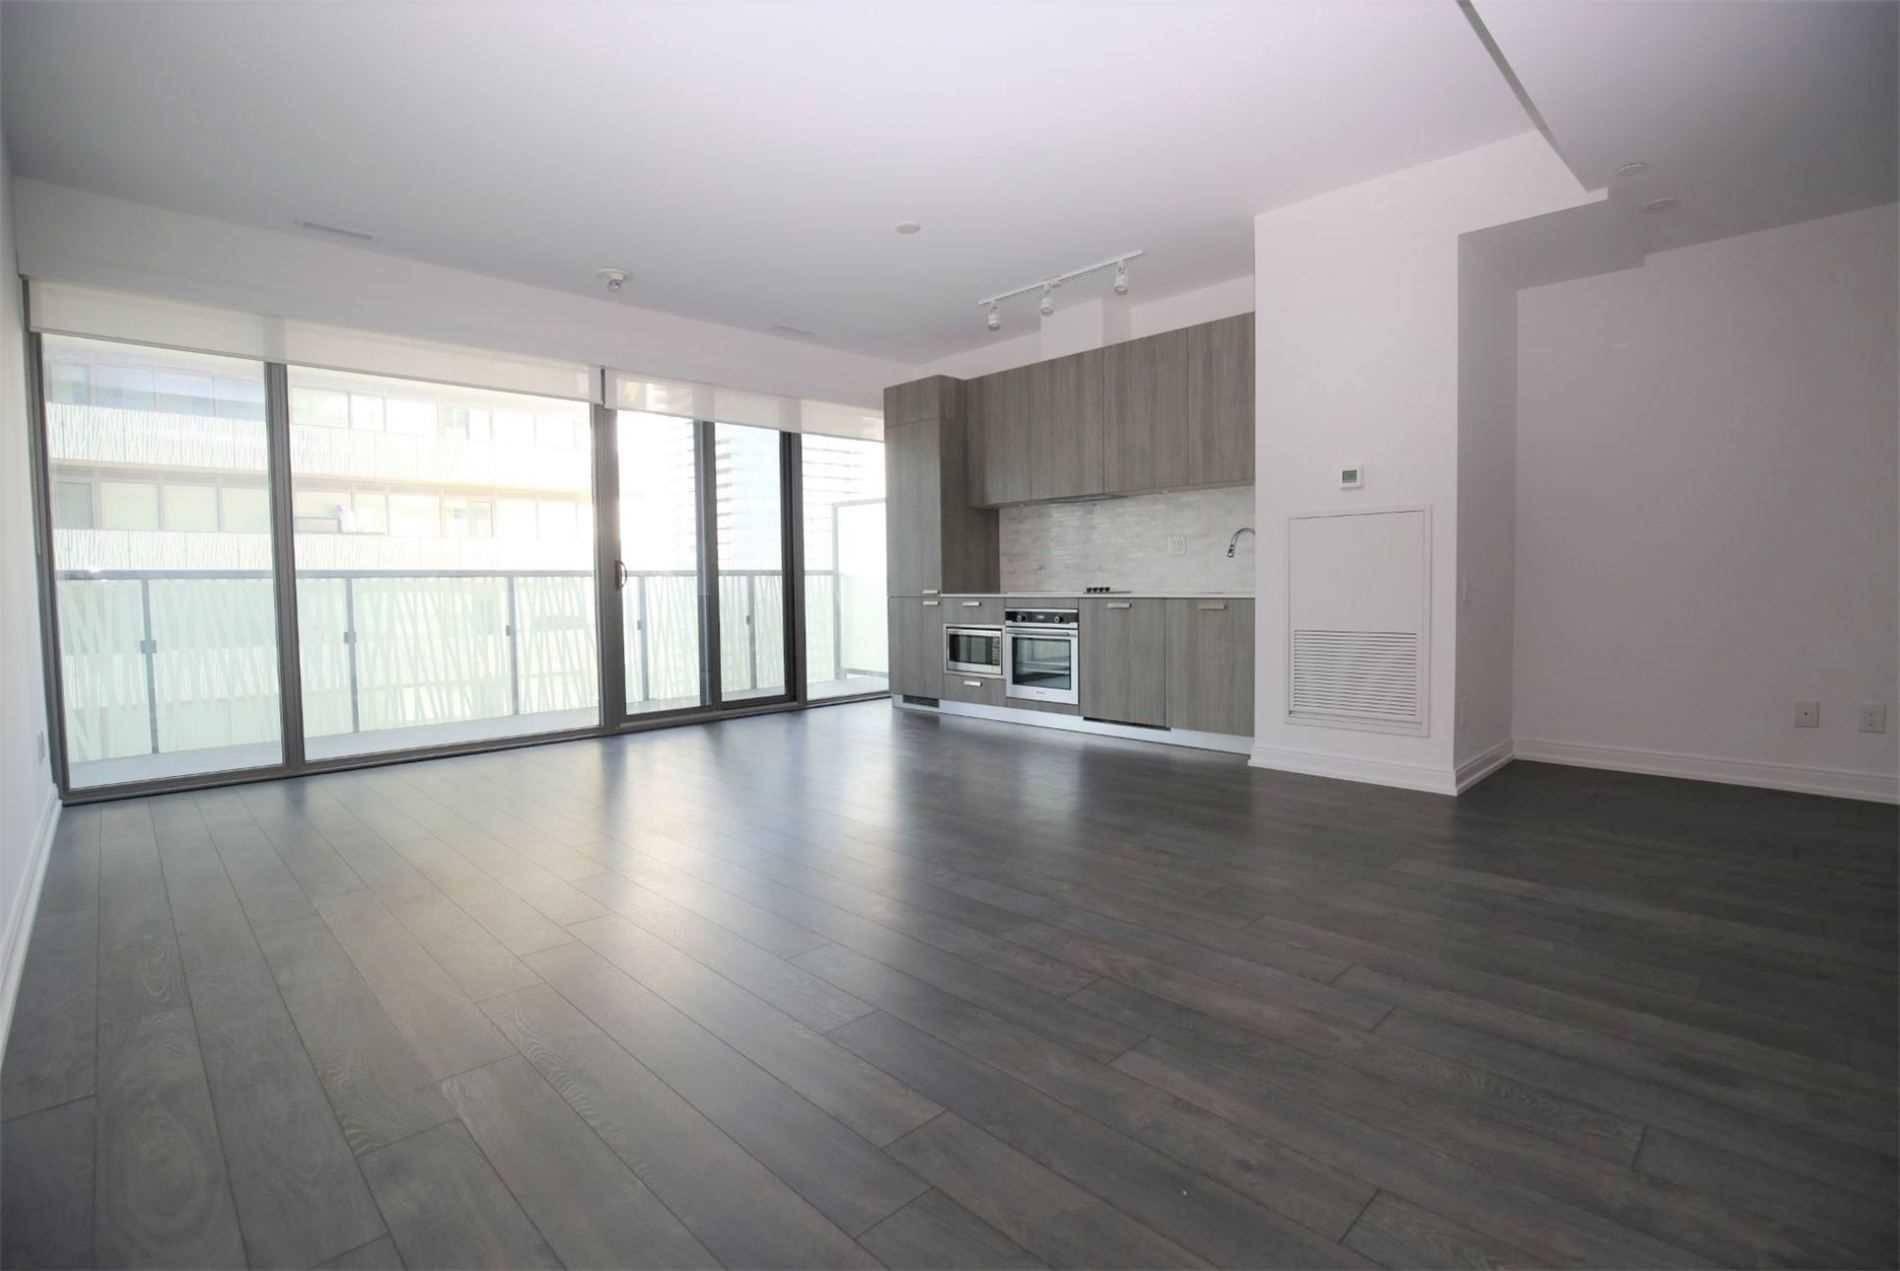 Apartment for rent at 50 Charles St Unit 4307 Toronto Ontario - MLS: C4548775